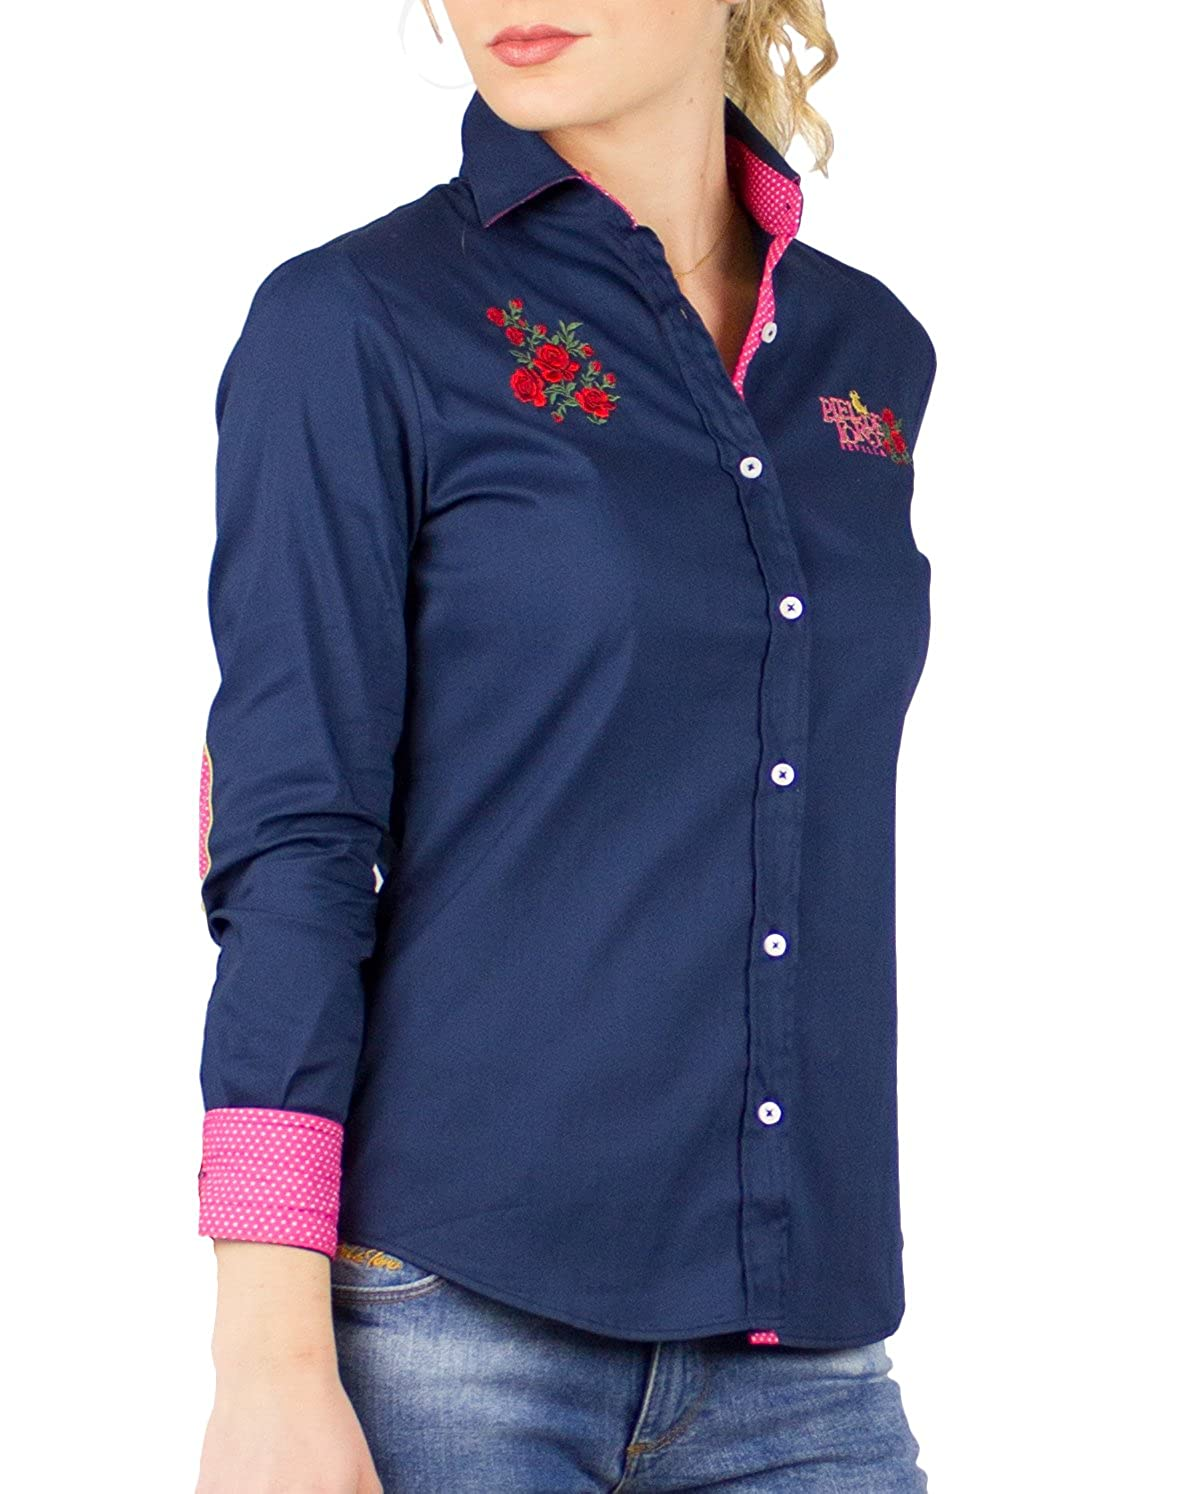 Piel de Toro 42142544 Camisa, Azul Marino 01, Large (Tamaño del ...